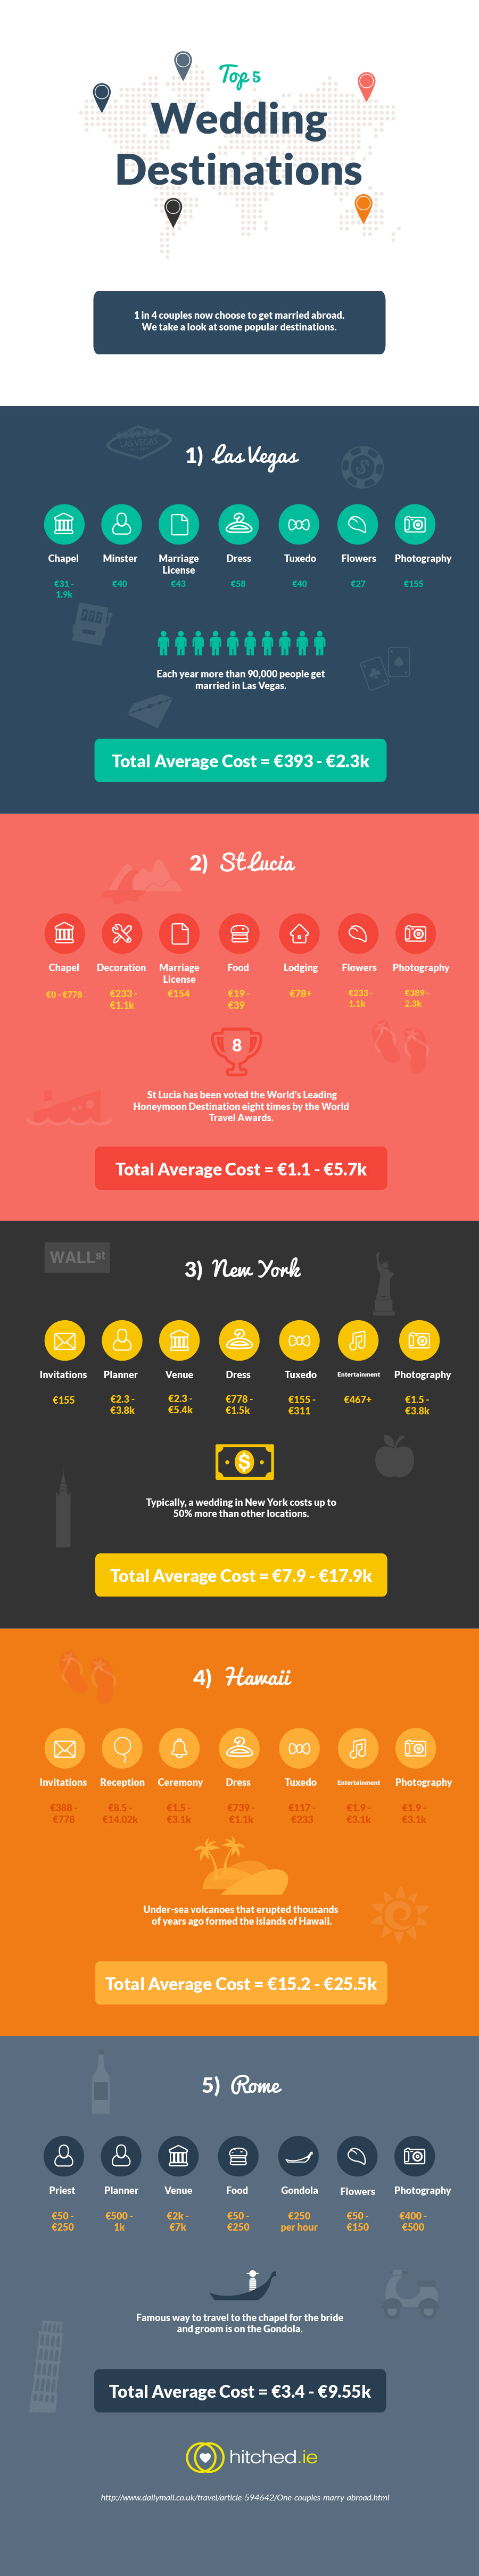 Top 5 Wedding Destinations [INFOGRAPHIC] – Infographic List